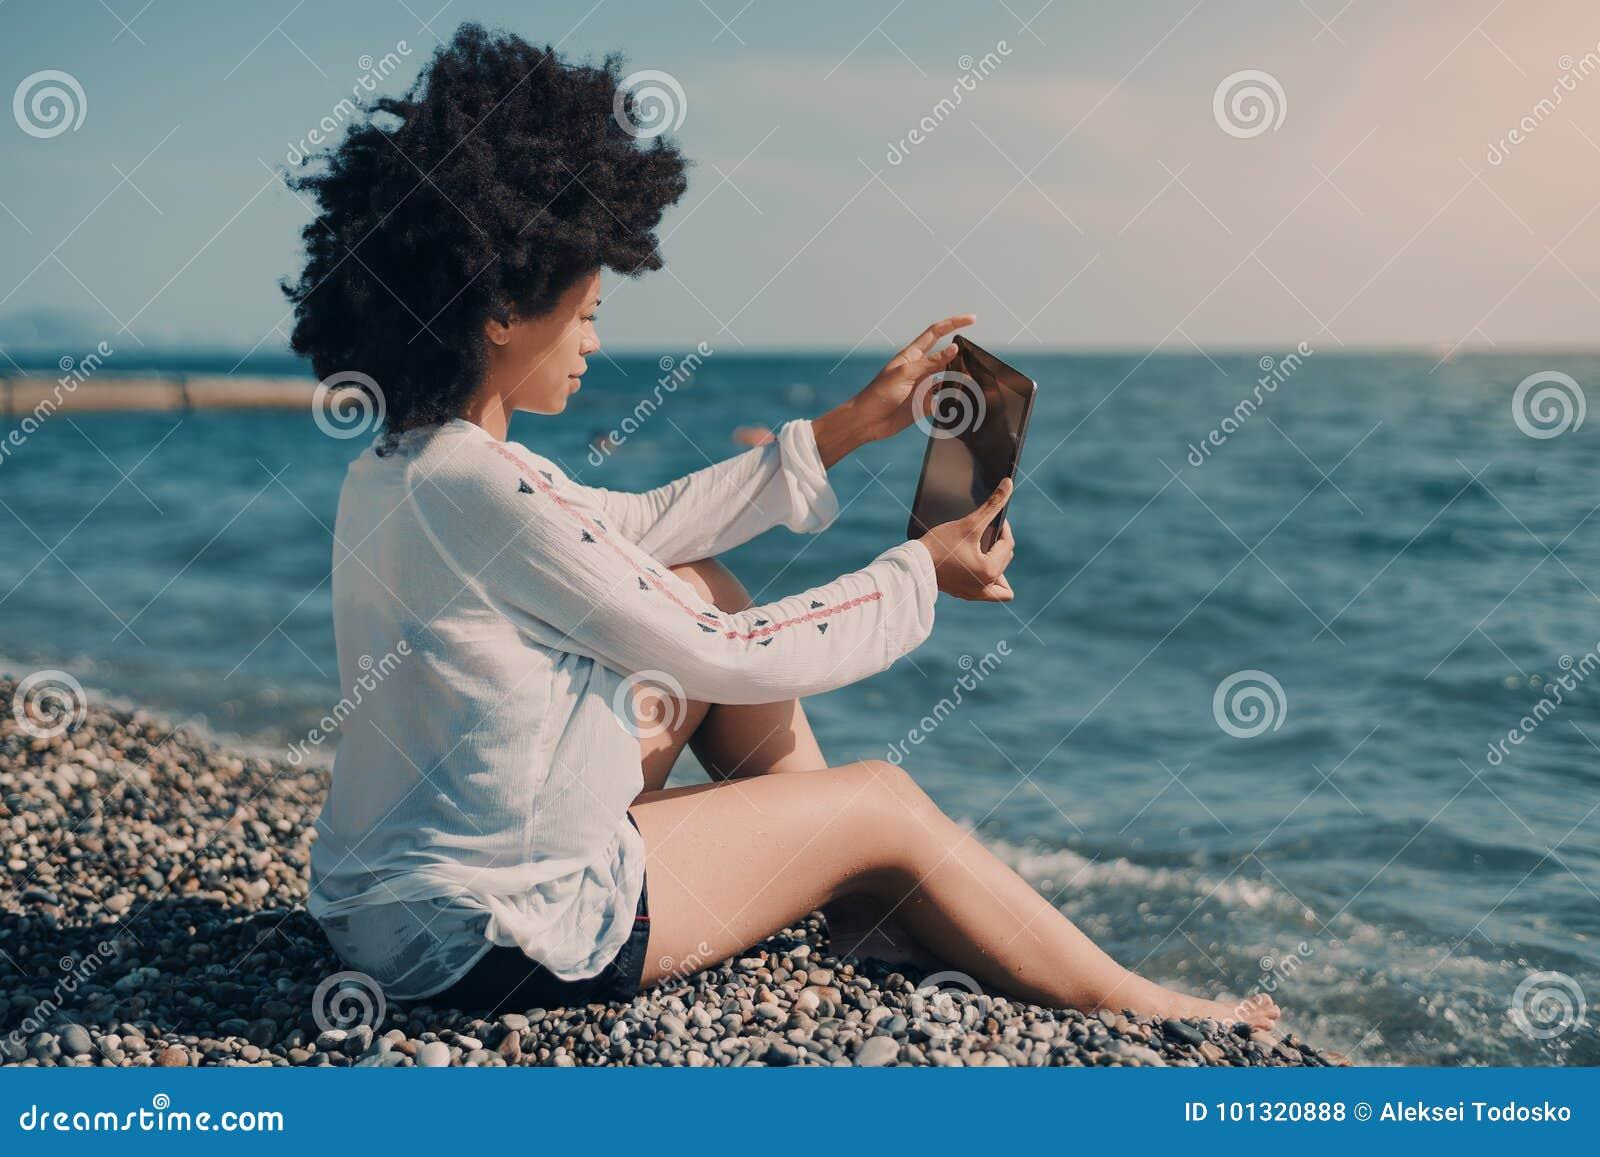 Imagefap beach orgies